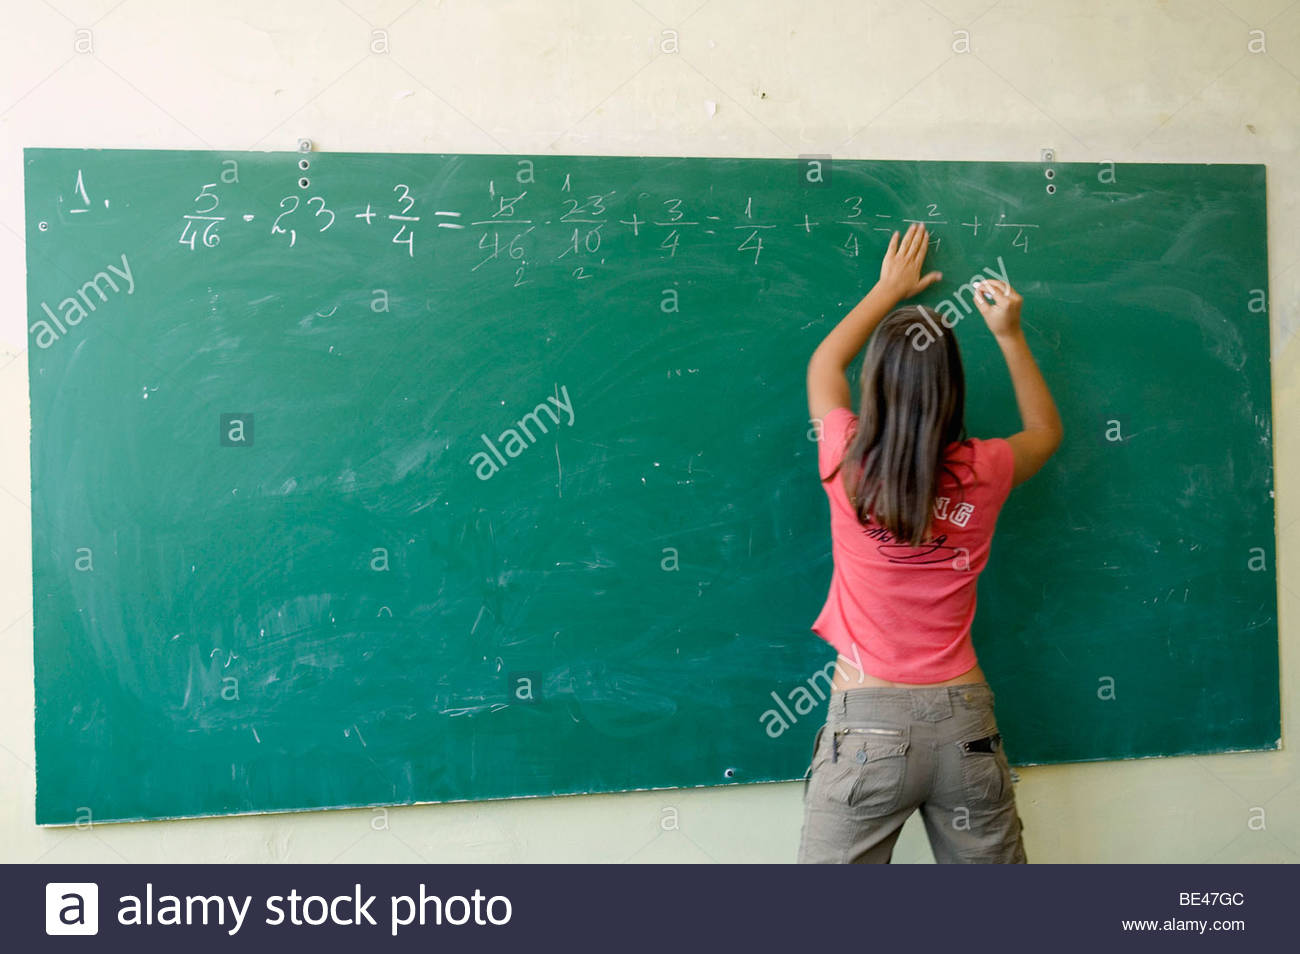 Serbia, Kosovo - Rear view of a girl writing on a blackboard Stock Photo